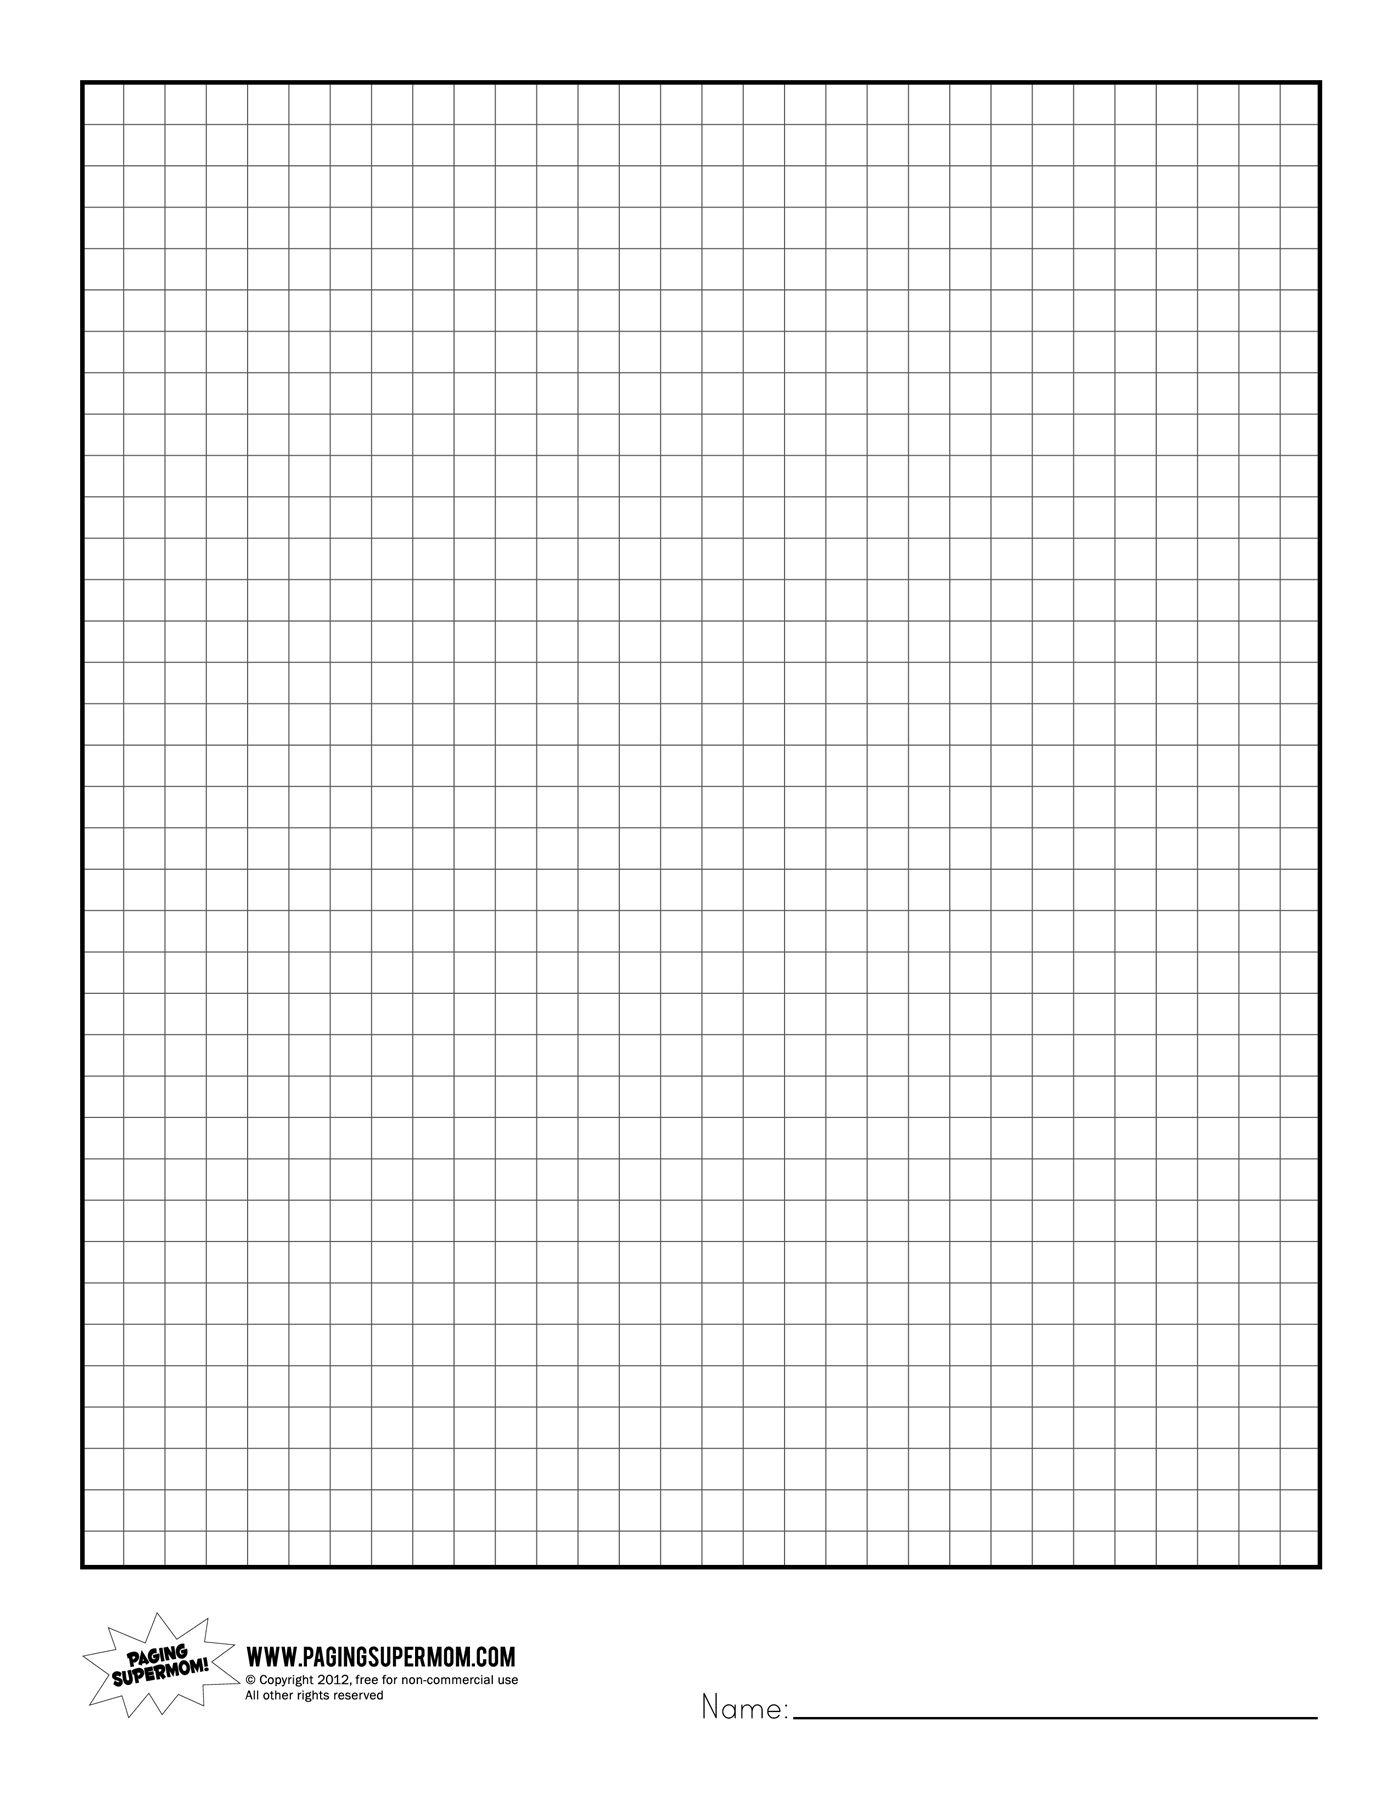 Printable Graph Paper | Healthy Eating | Grid Paper Printable - Free Printable Grid Paper